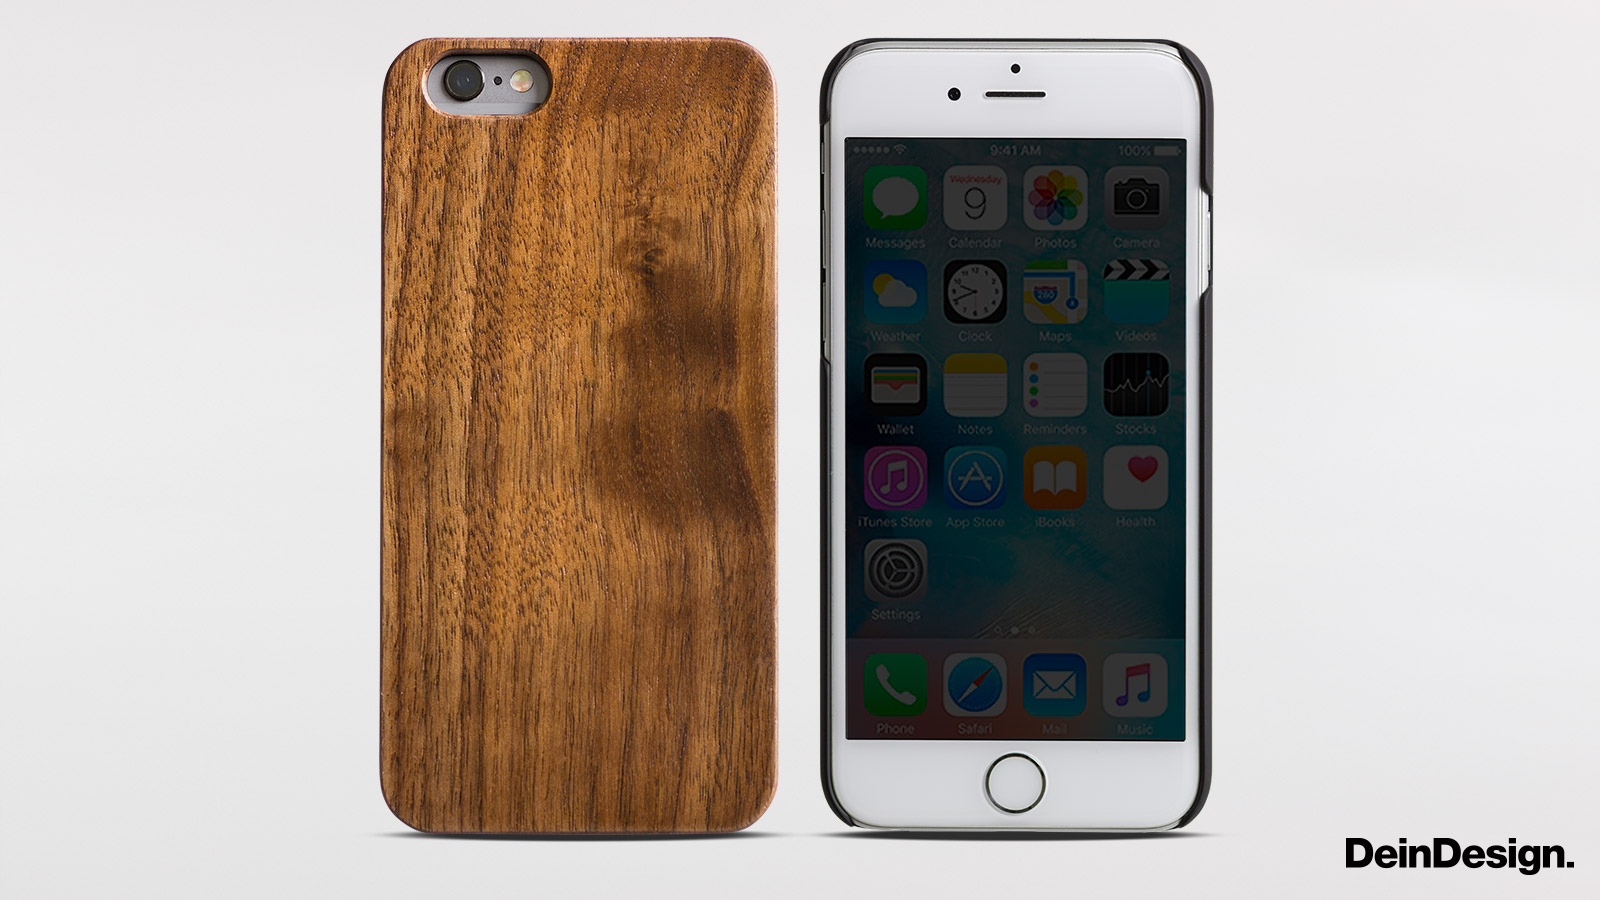 holz hard case pure walnuss f r apple iphone se von deindesign. Black Bedroom Furniture Sets. Home Design Ideas